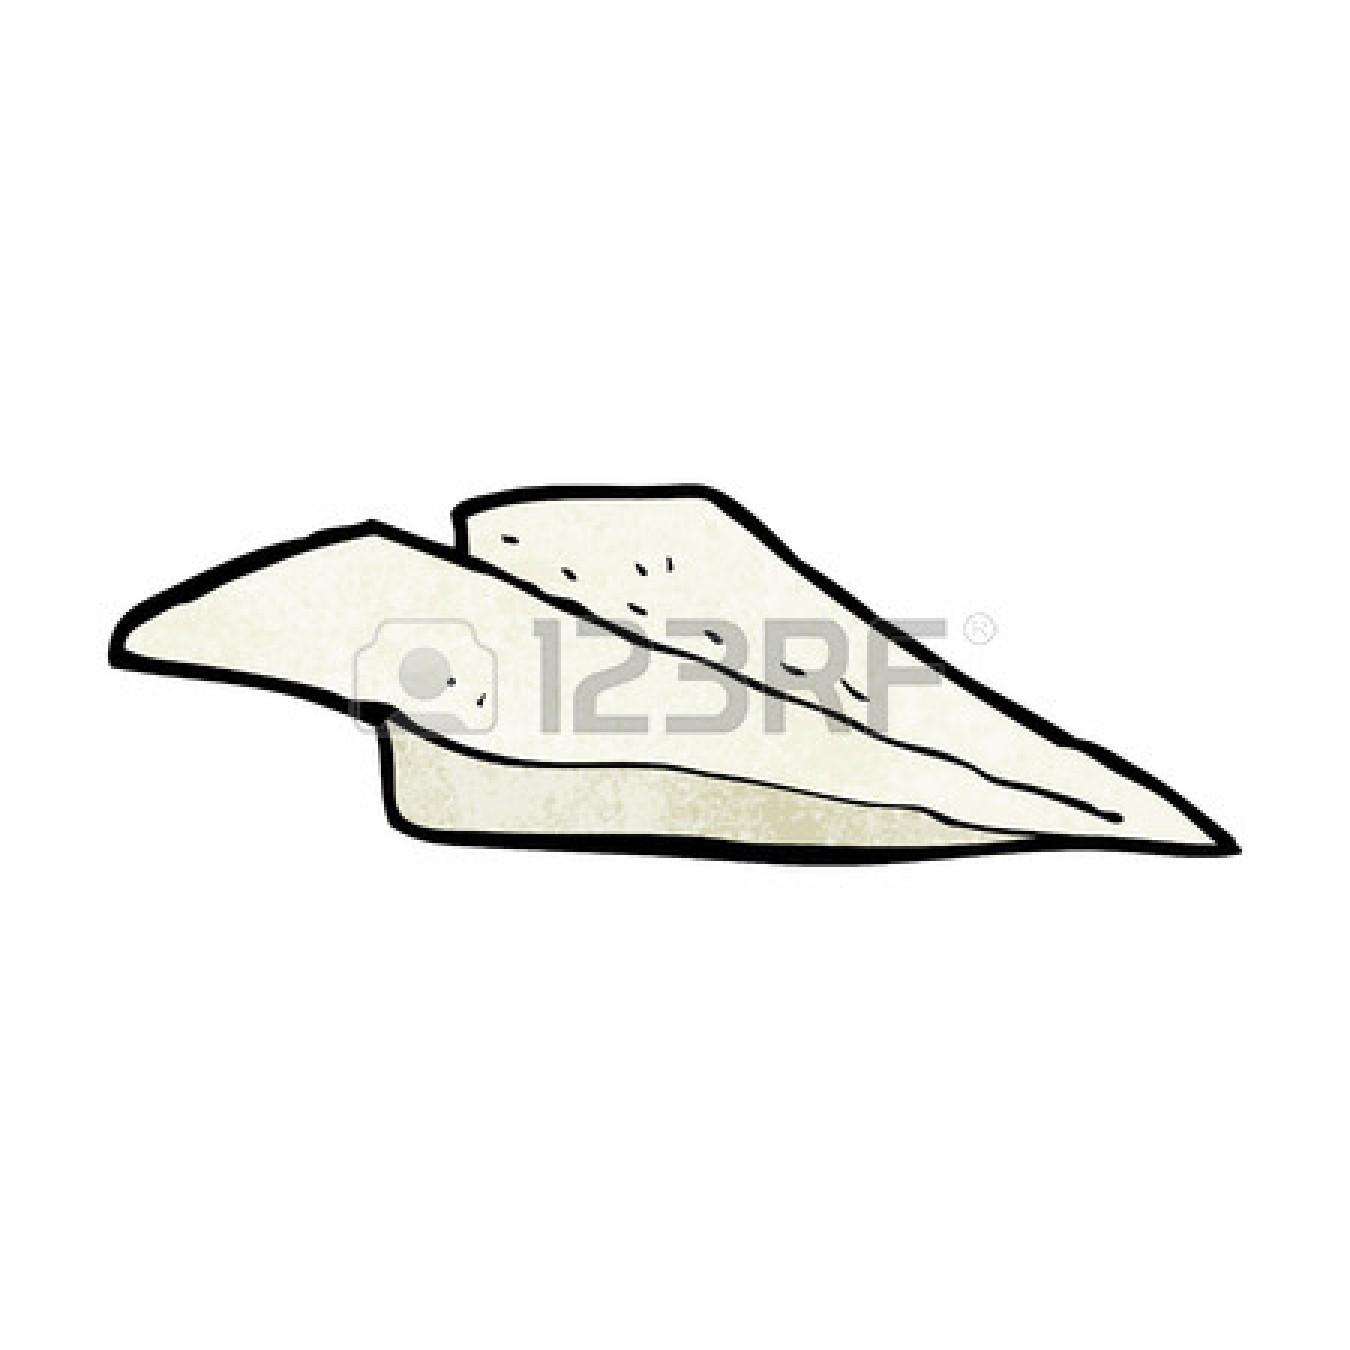 1350x1350 Paper Airplane Drawing Tumblr Clipart Panda